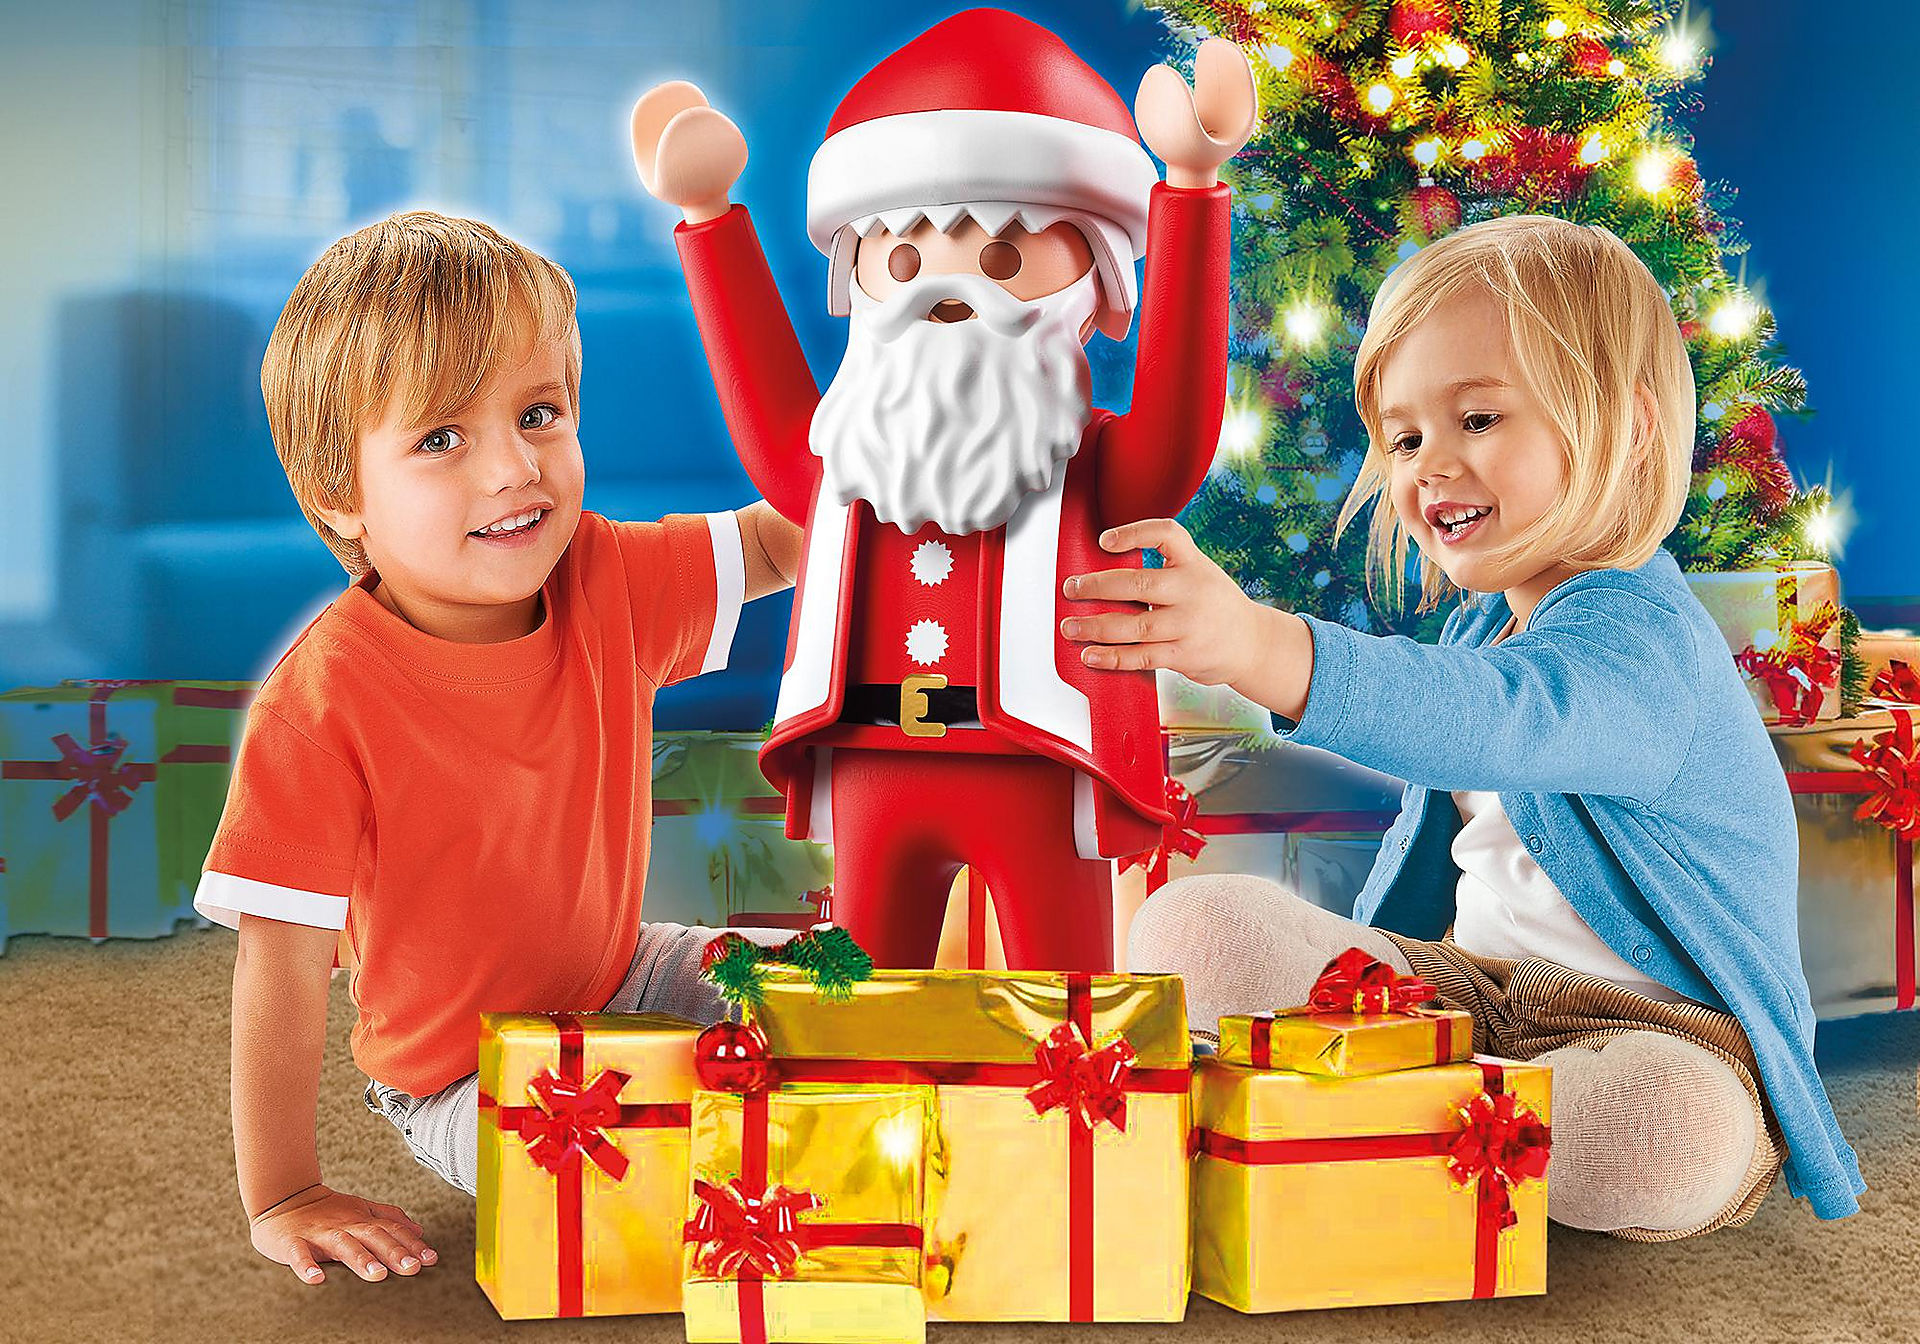 6629 PLAYMOBIL XXL-Weihnachtsmann zoom image1